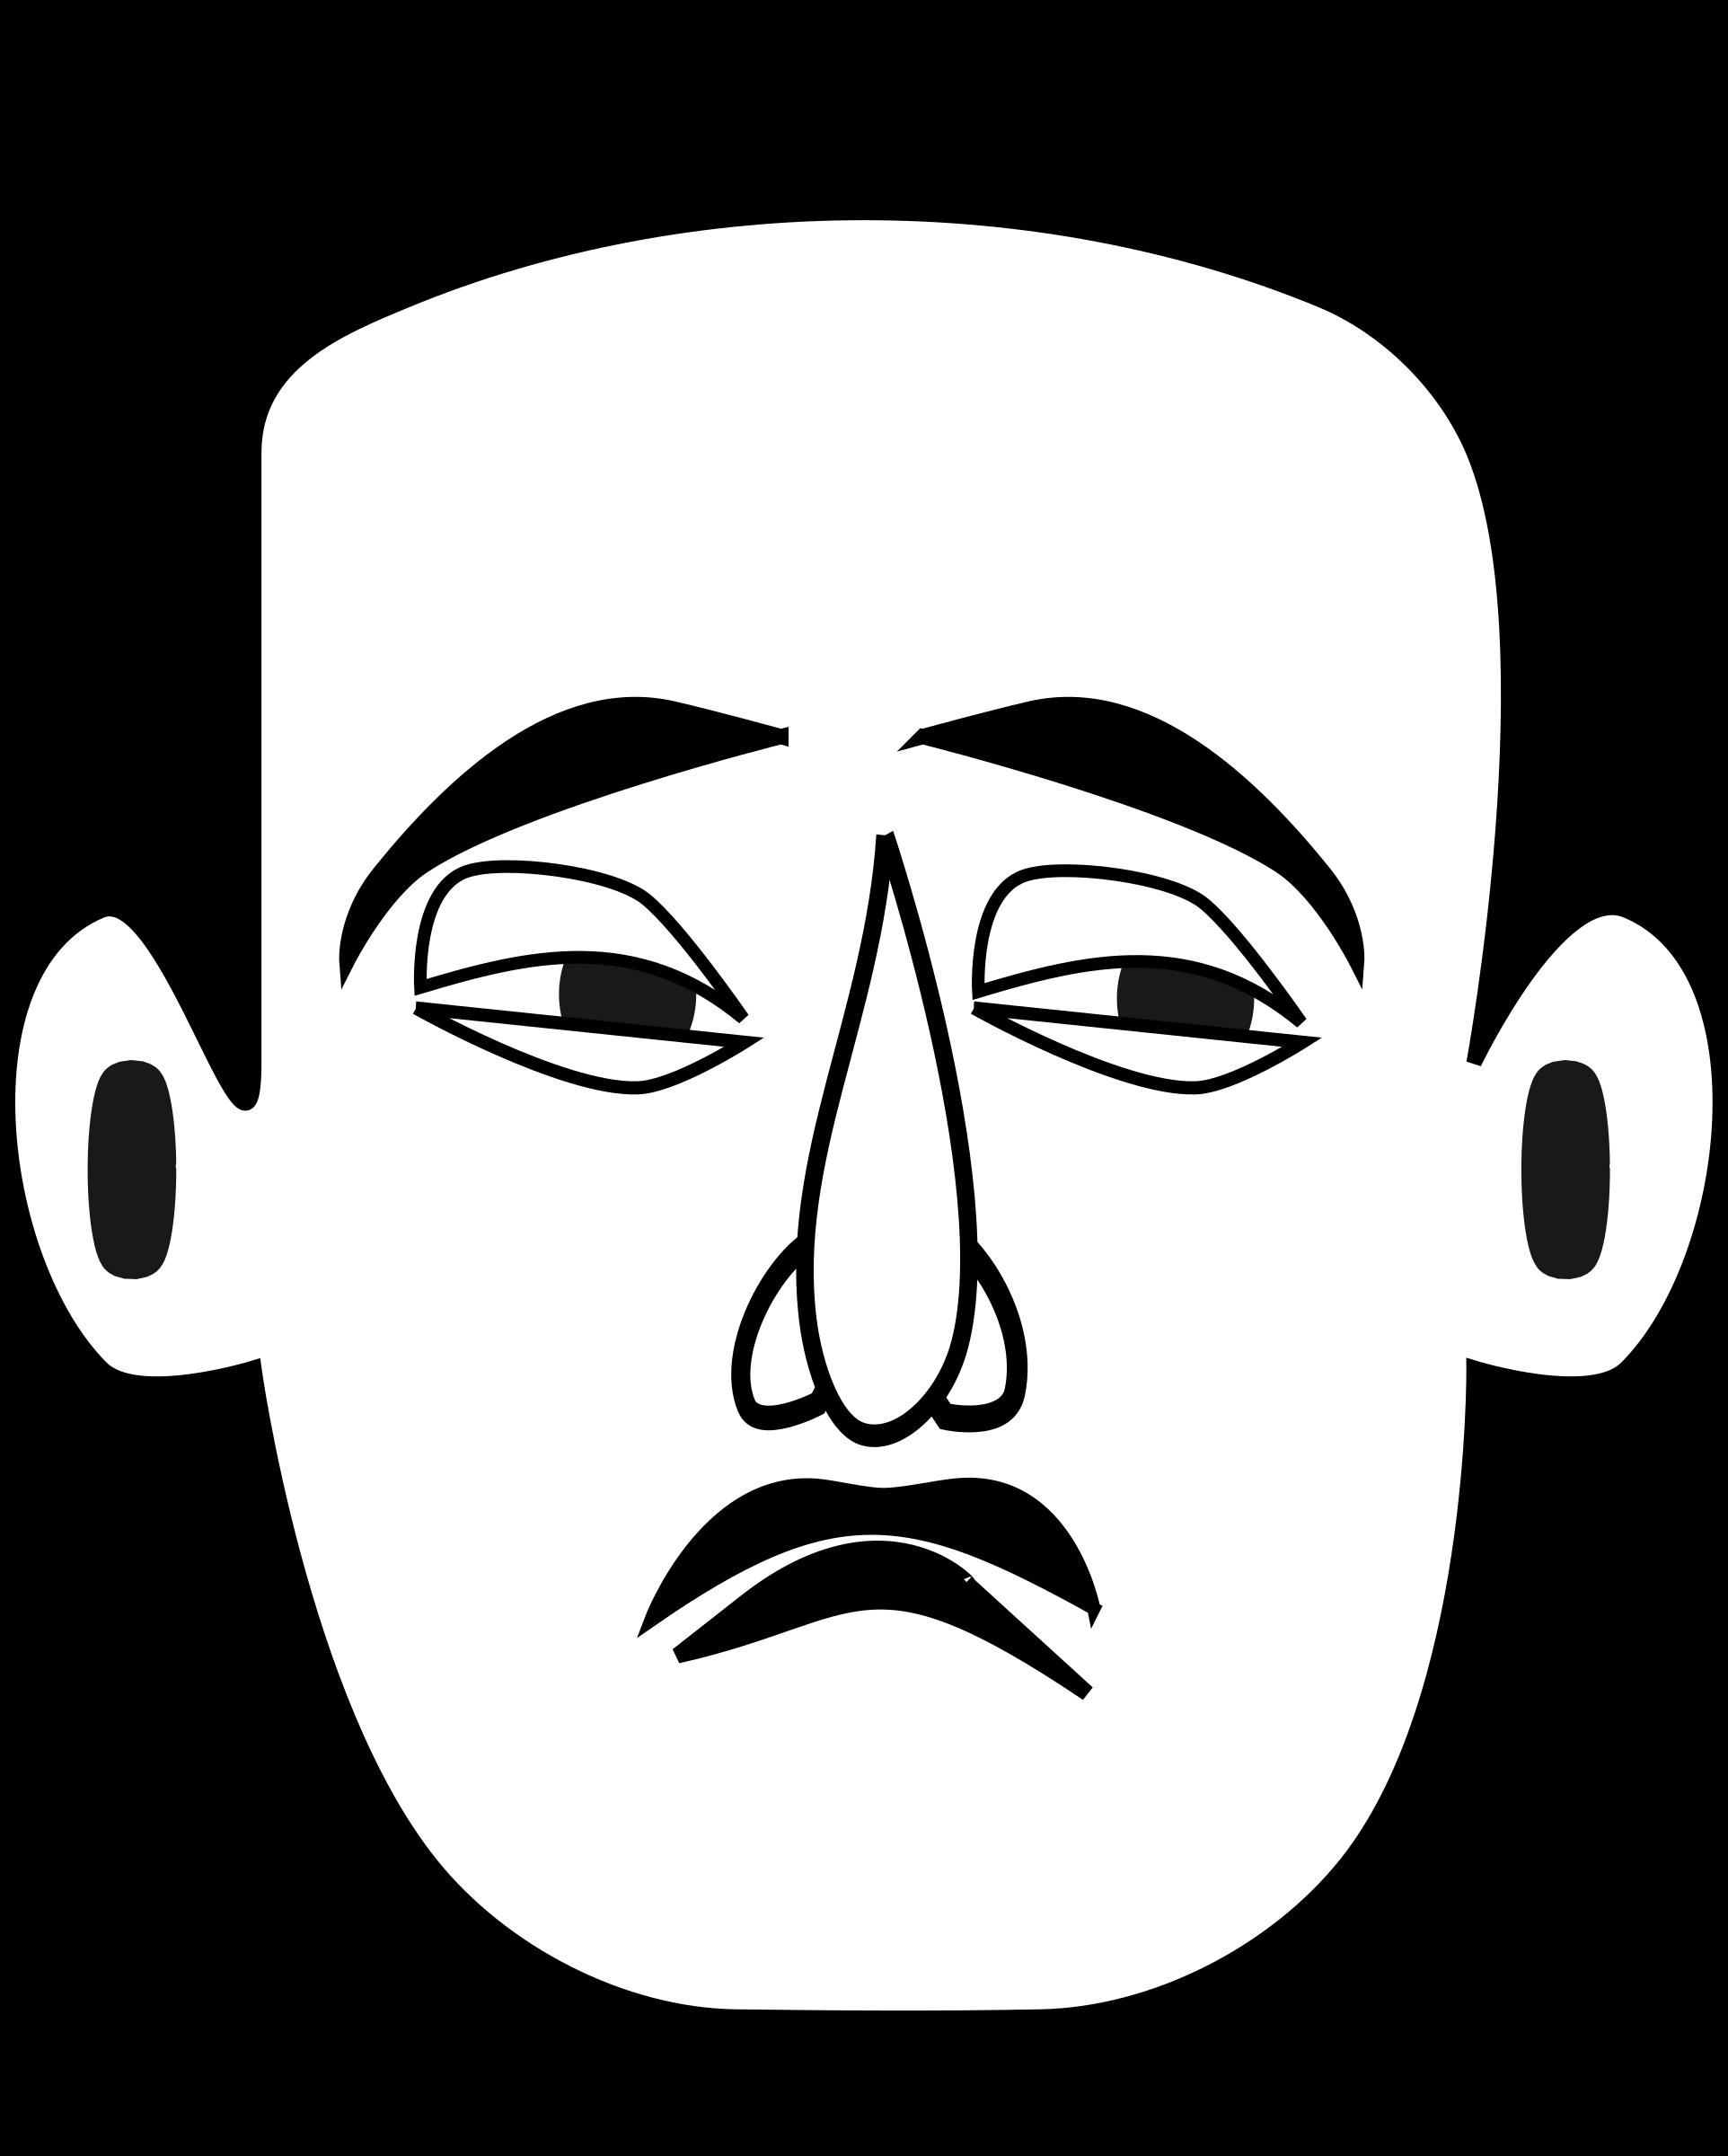 Face emotions big image. Eyebrow clipart sad